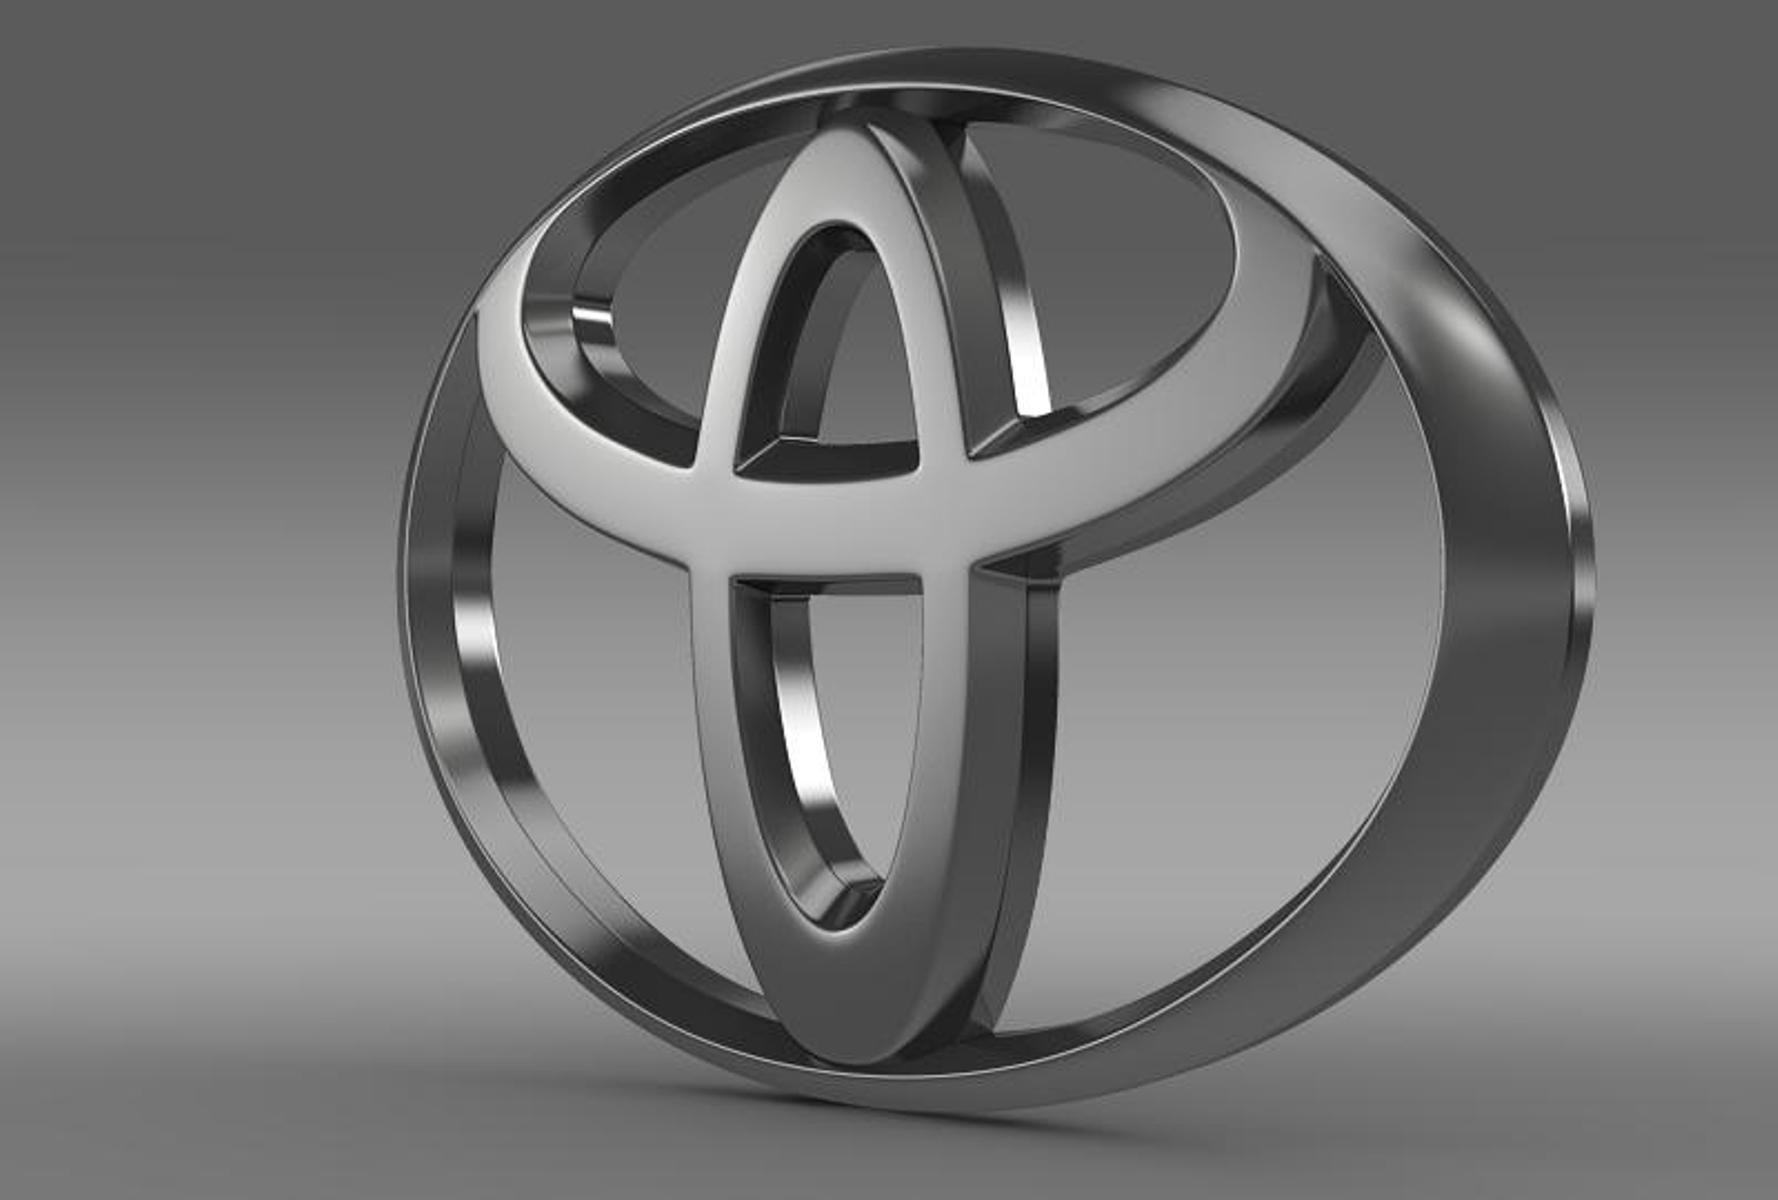 Toyota Logo Full Hd Wallpapers Free Download 11 Http Www Urdunewtrend Com Hd Wallpapers Motors Toyota Logo Toyota Logo Full Hd Wallpapers Free Download 11